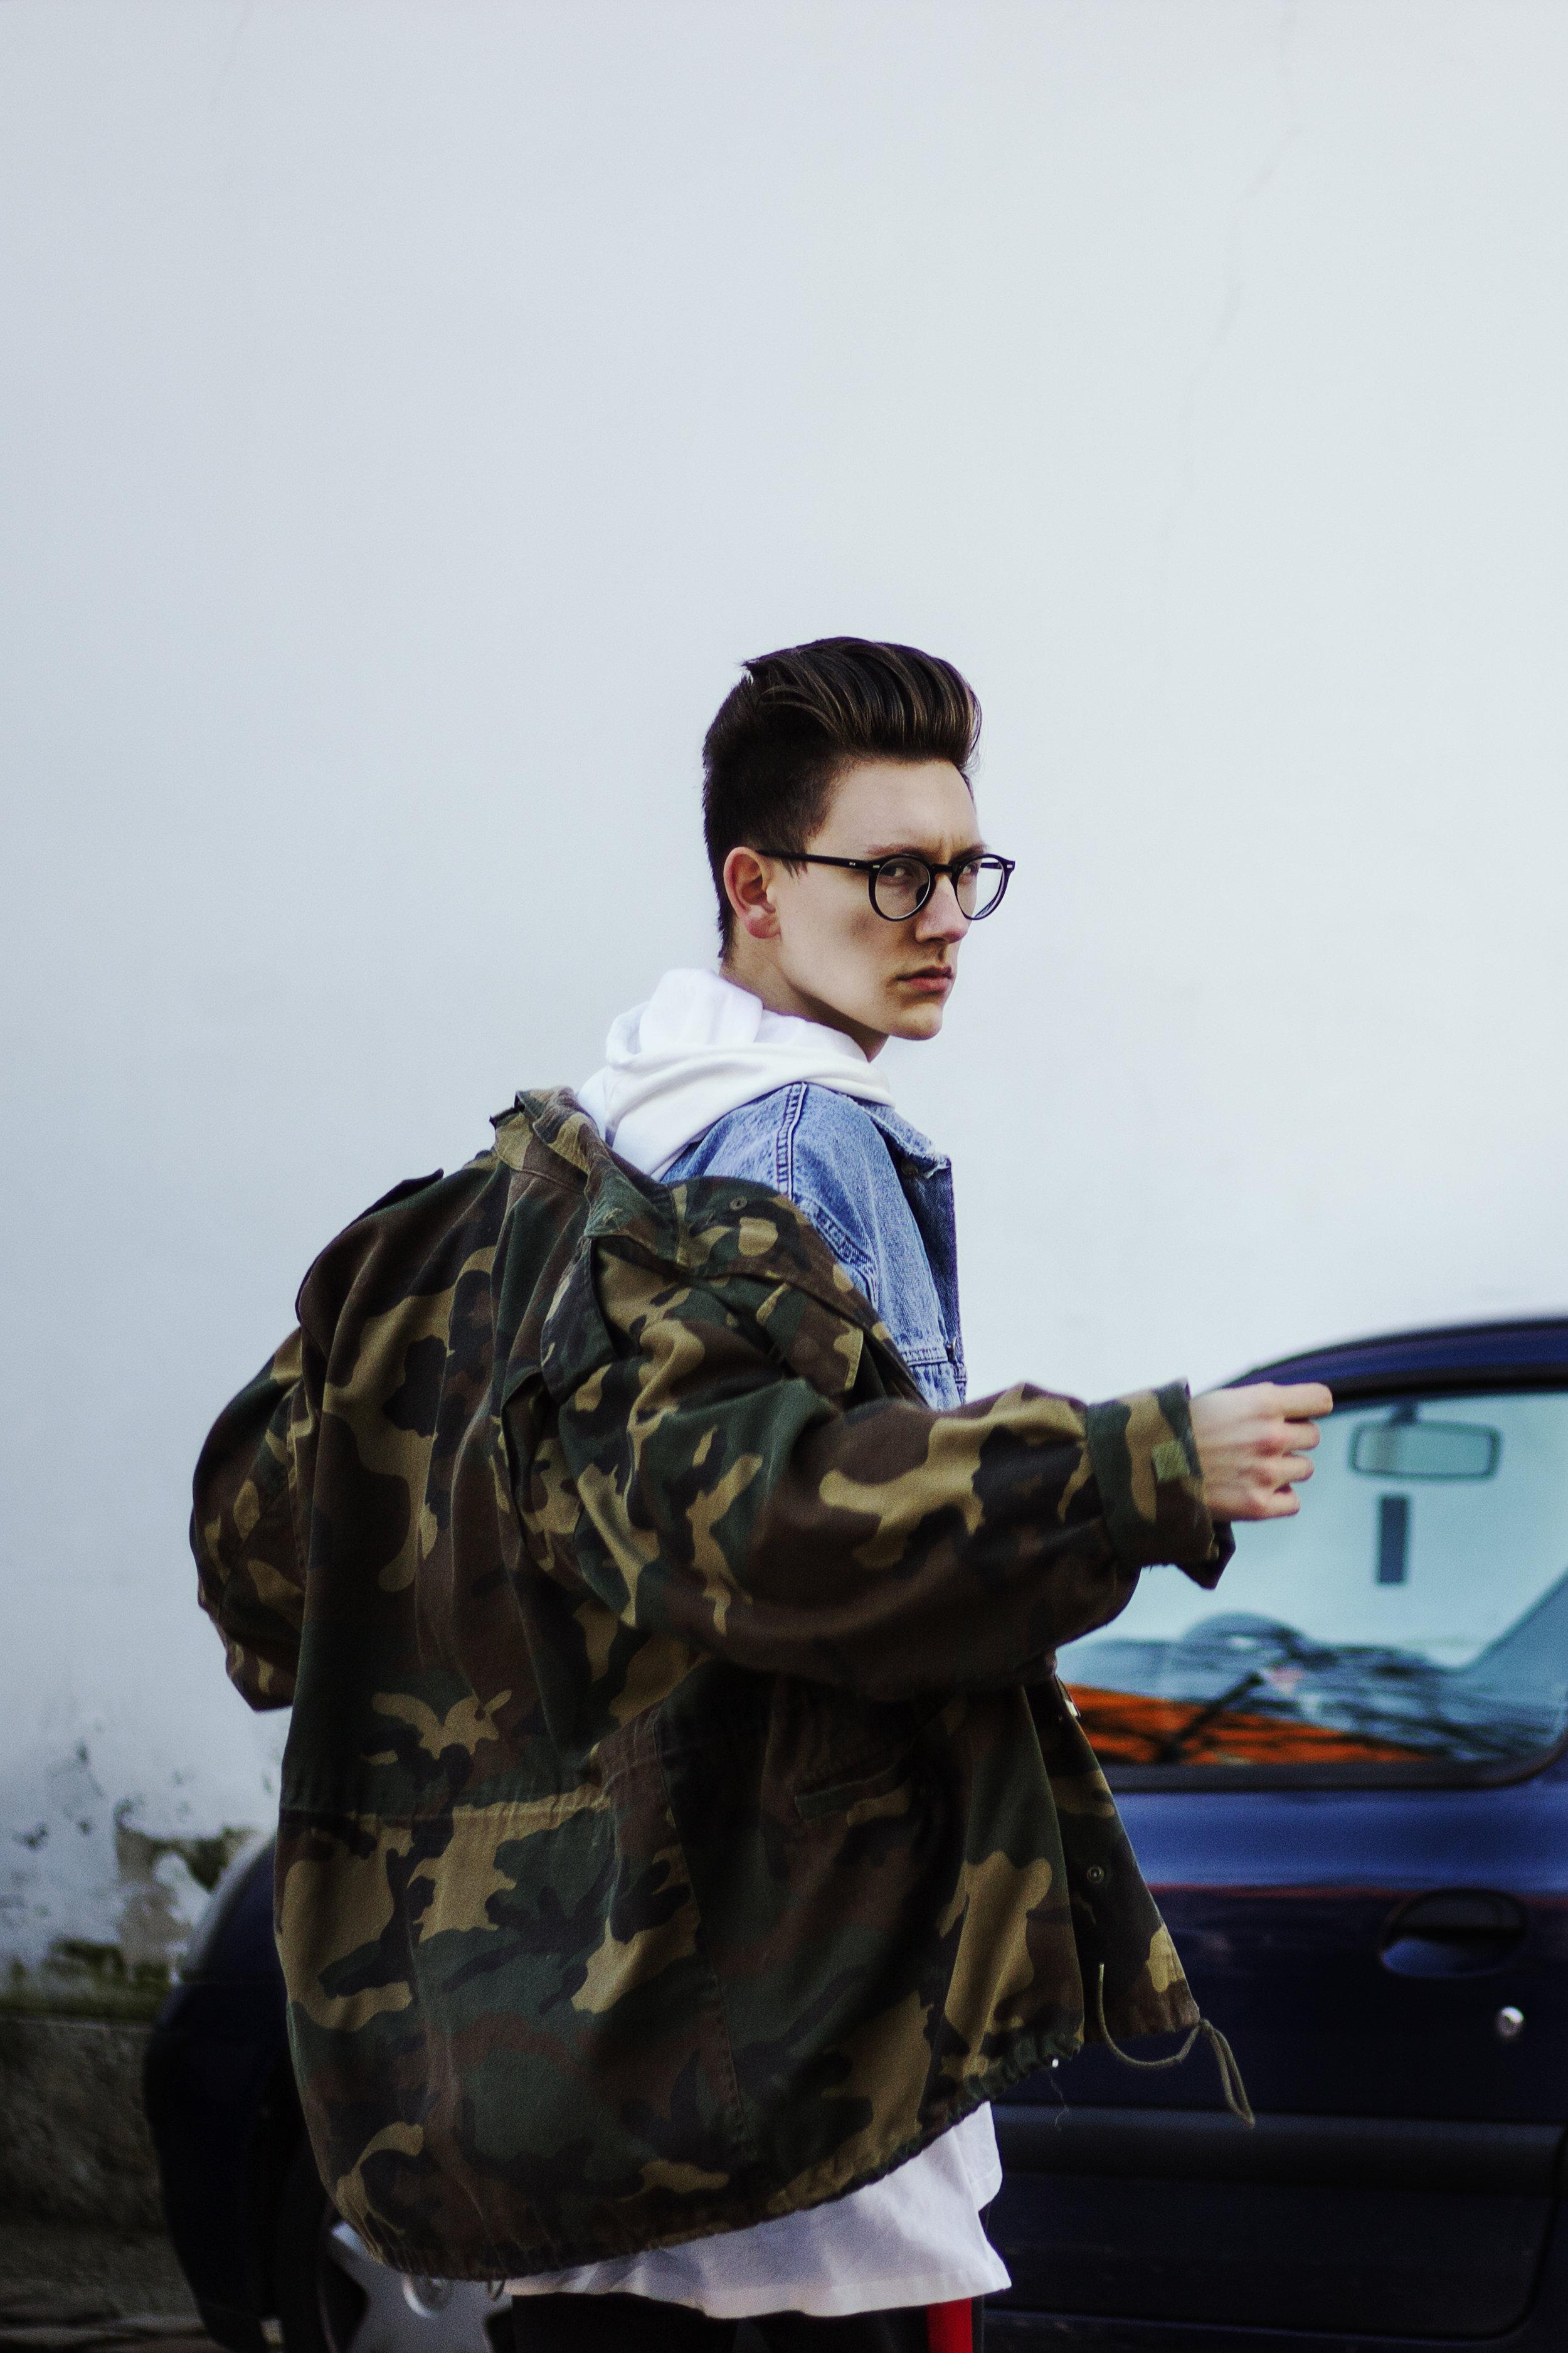 luka-lajic-expensive-reality-hm-mens-fashion-croatia-blogger  (8).jpg